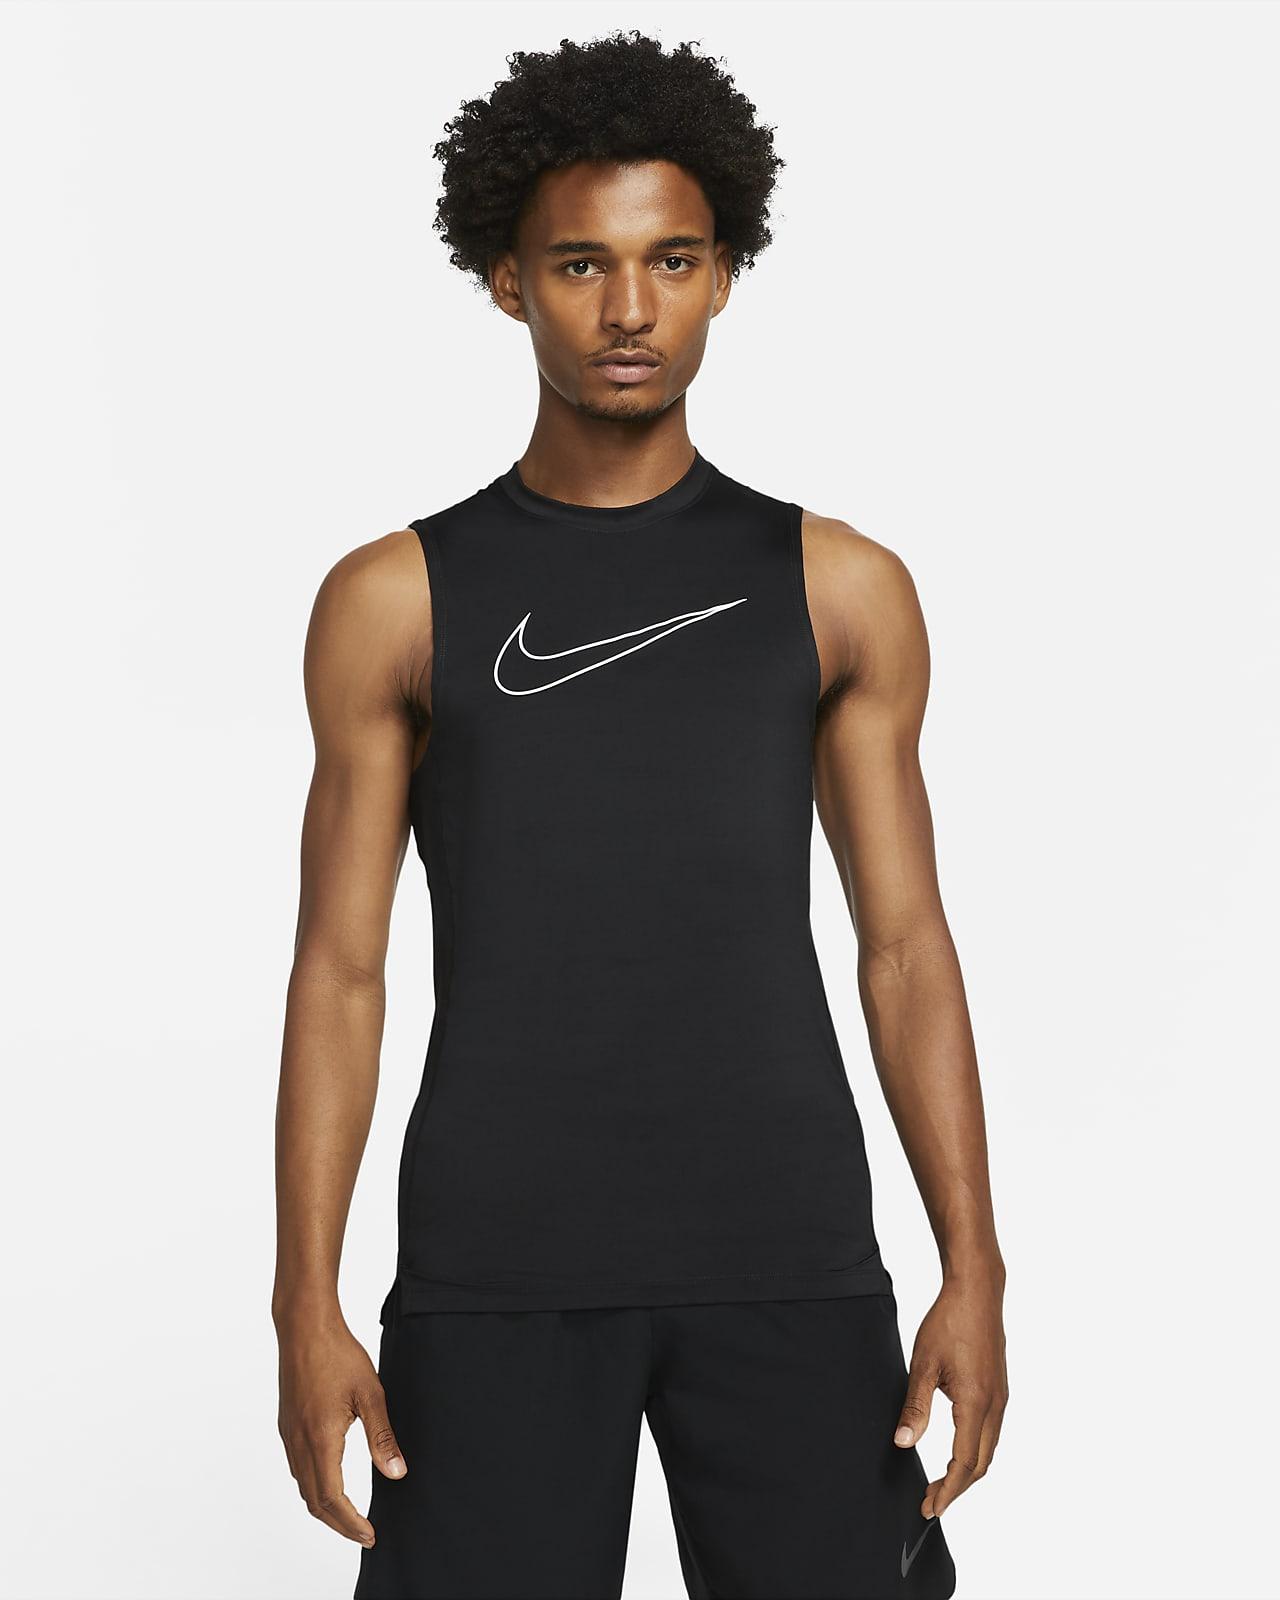 Nike Pro Dri-FIT Men's Tight-Fit Sleeveless Top